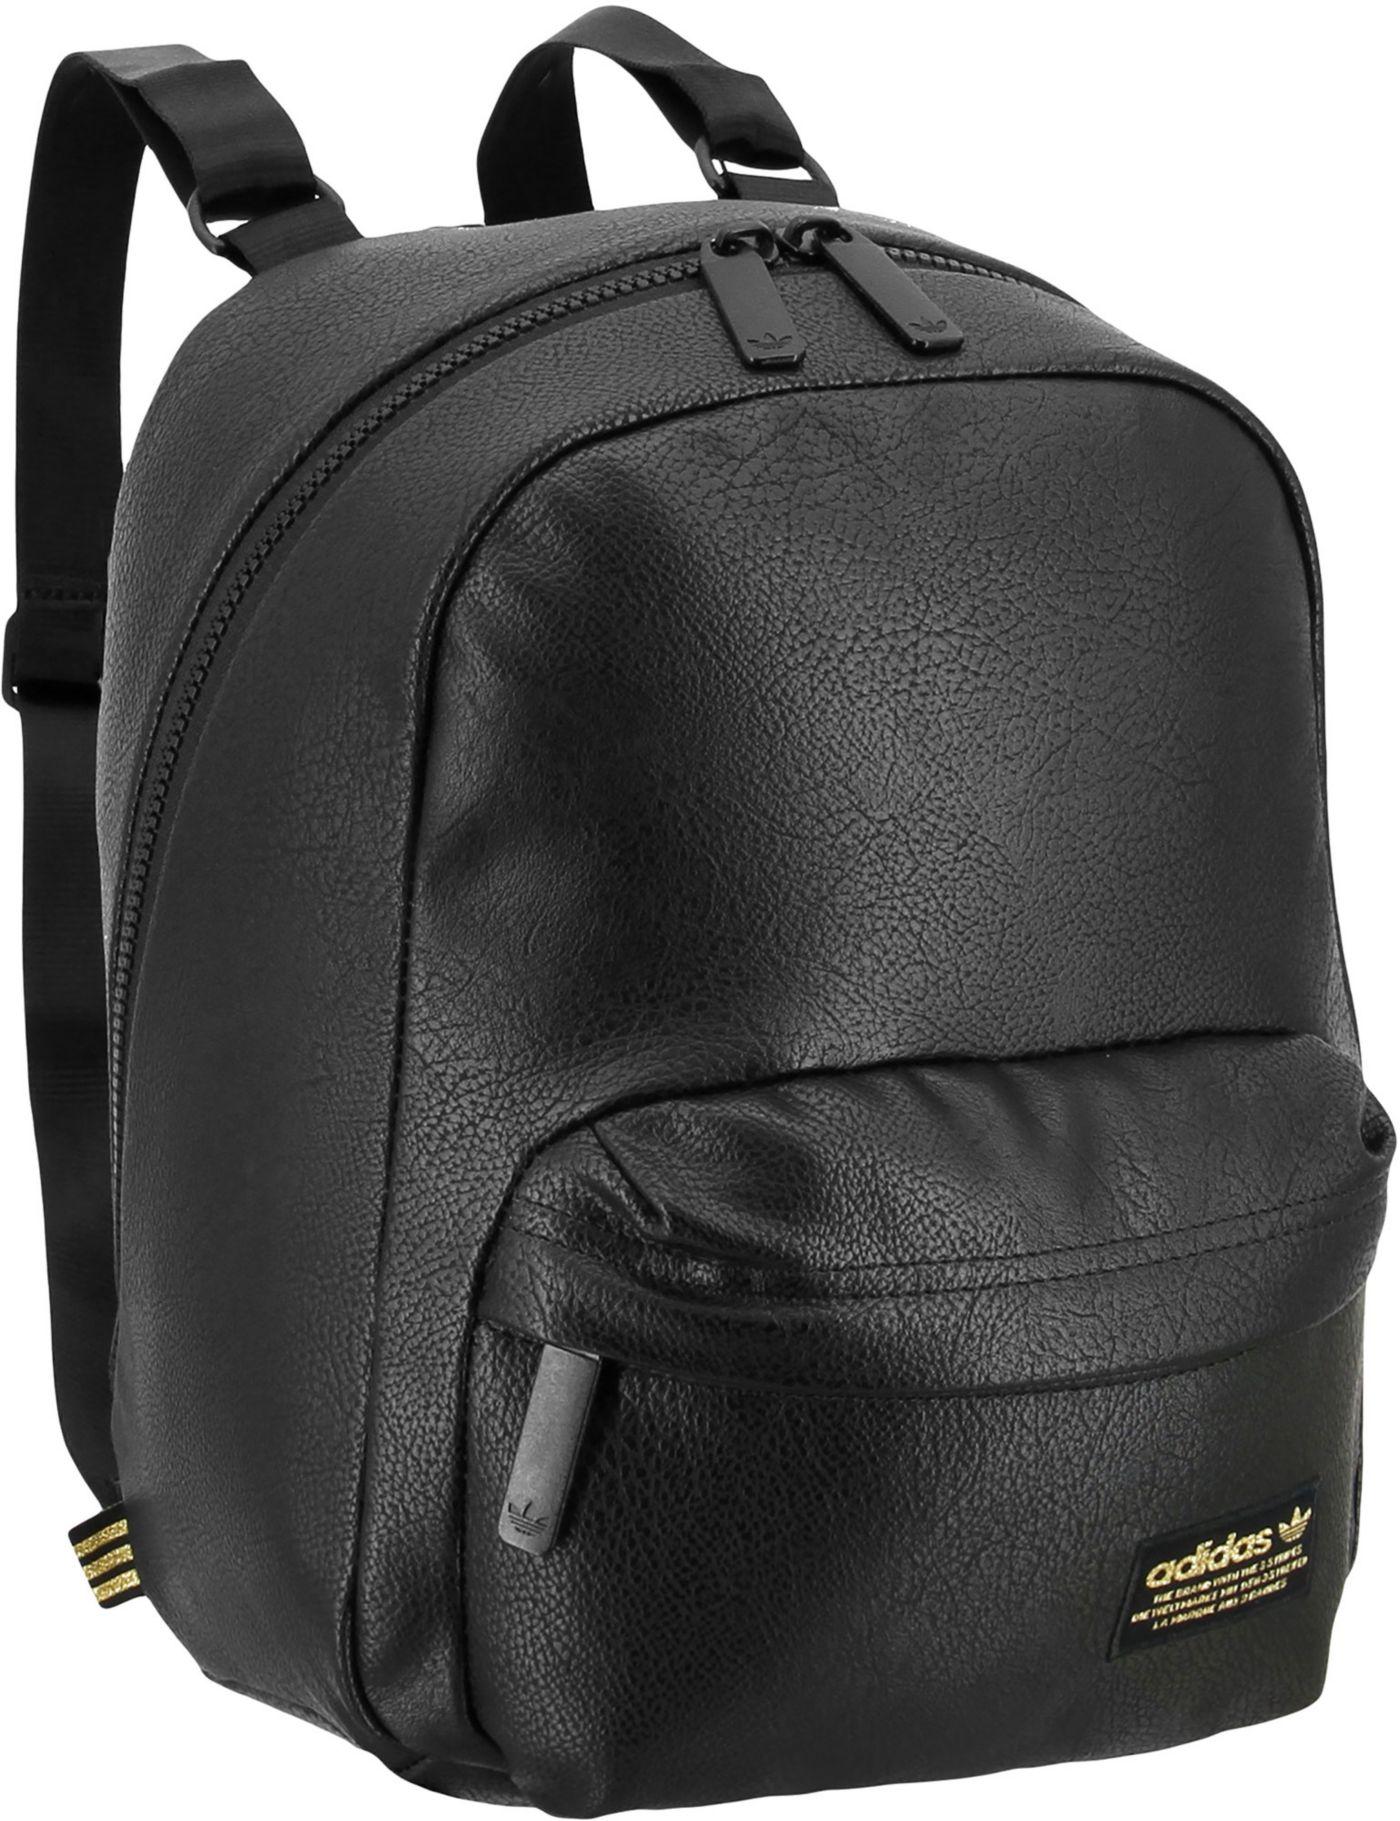 adidas Originals Women's National Compact Premium Backpack